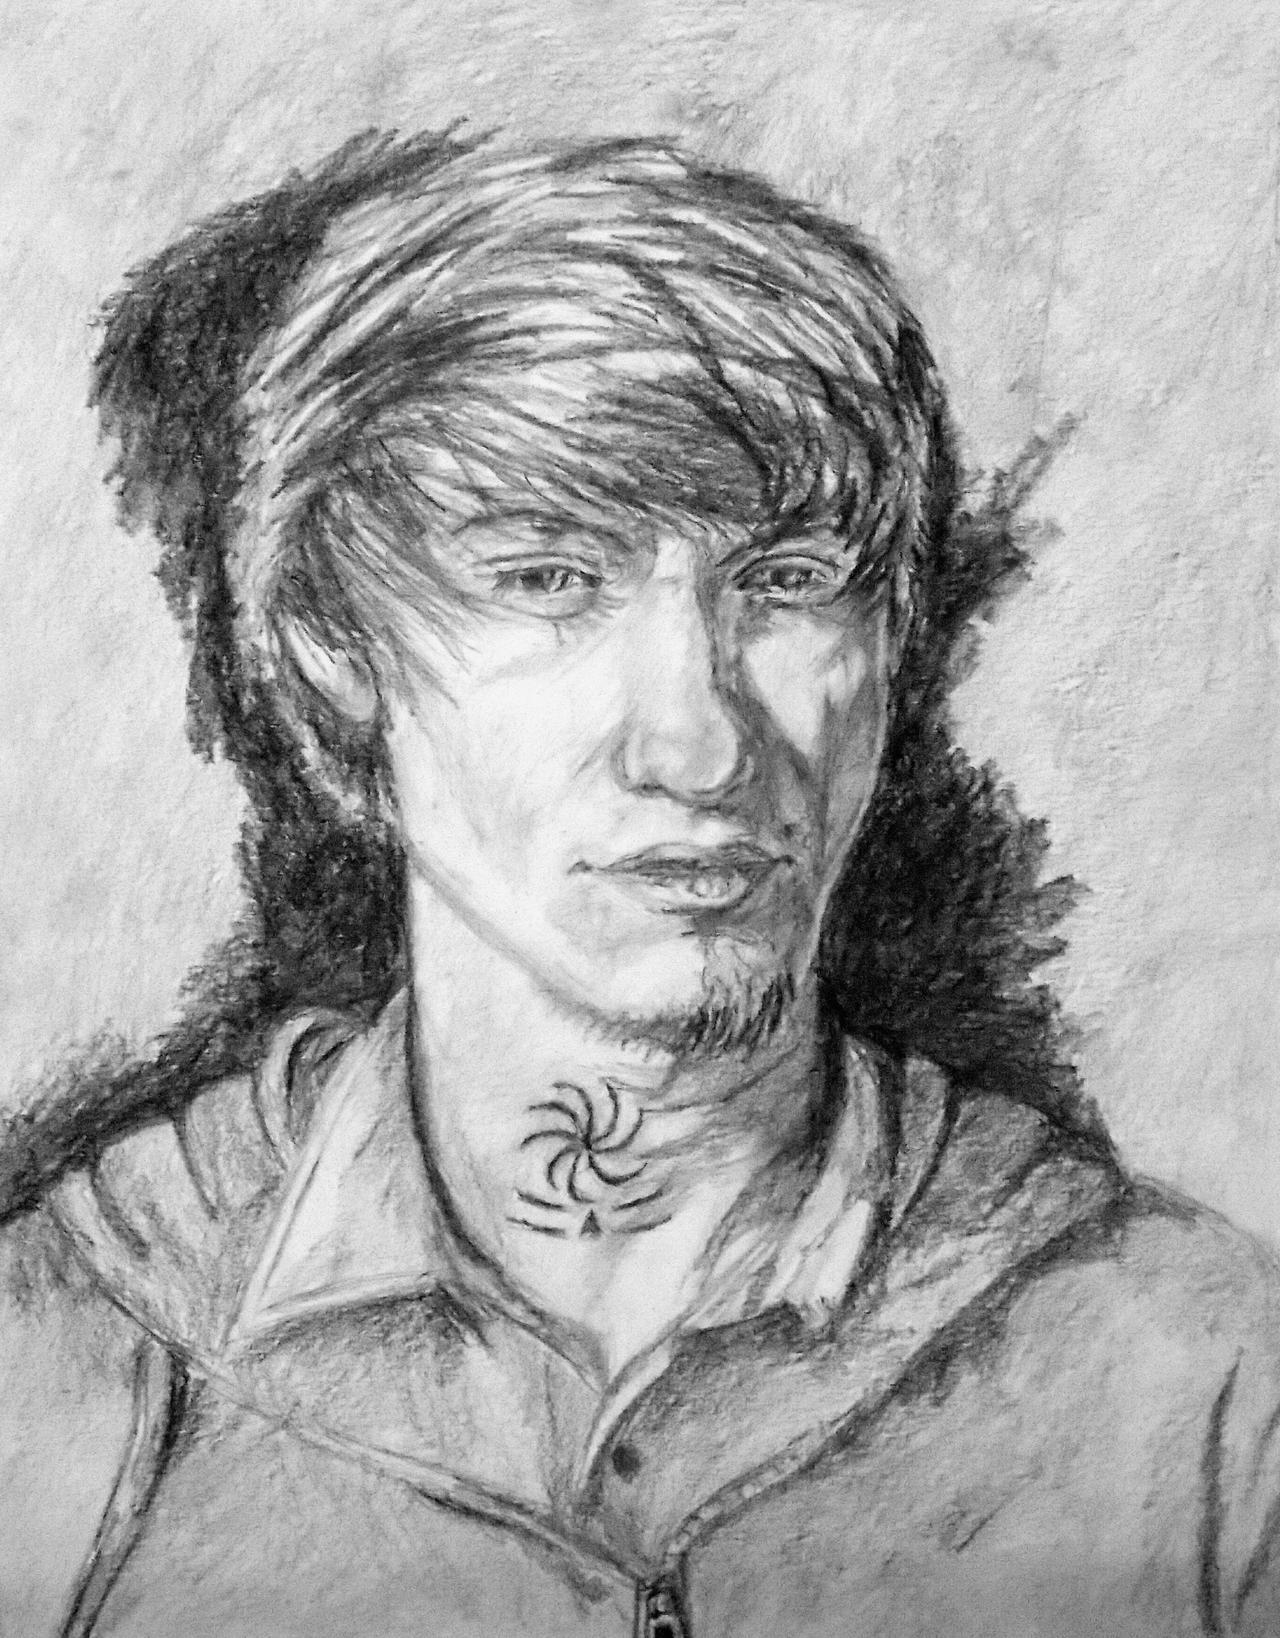 Jarredsart's Profile Picture